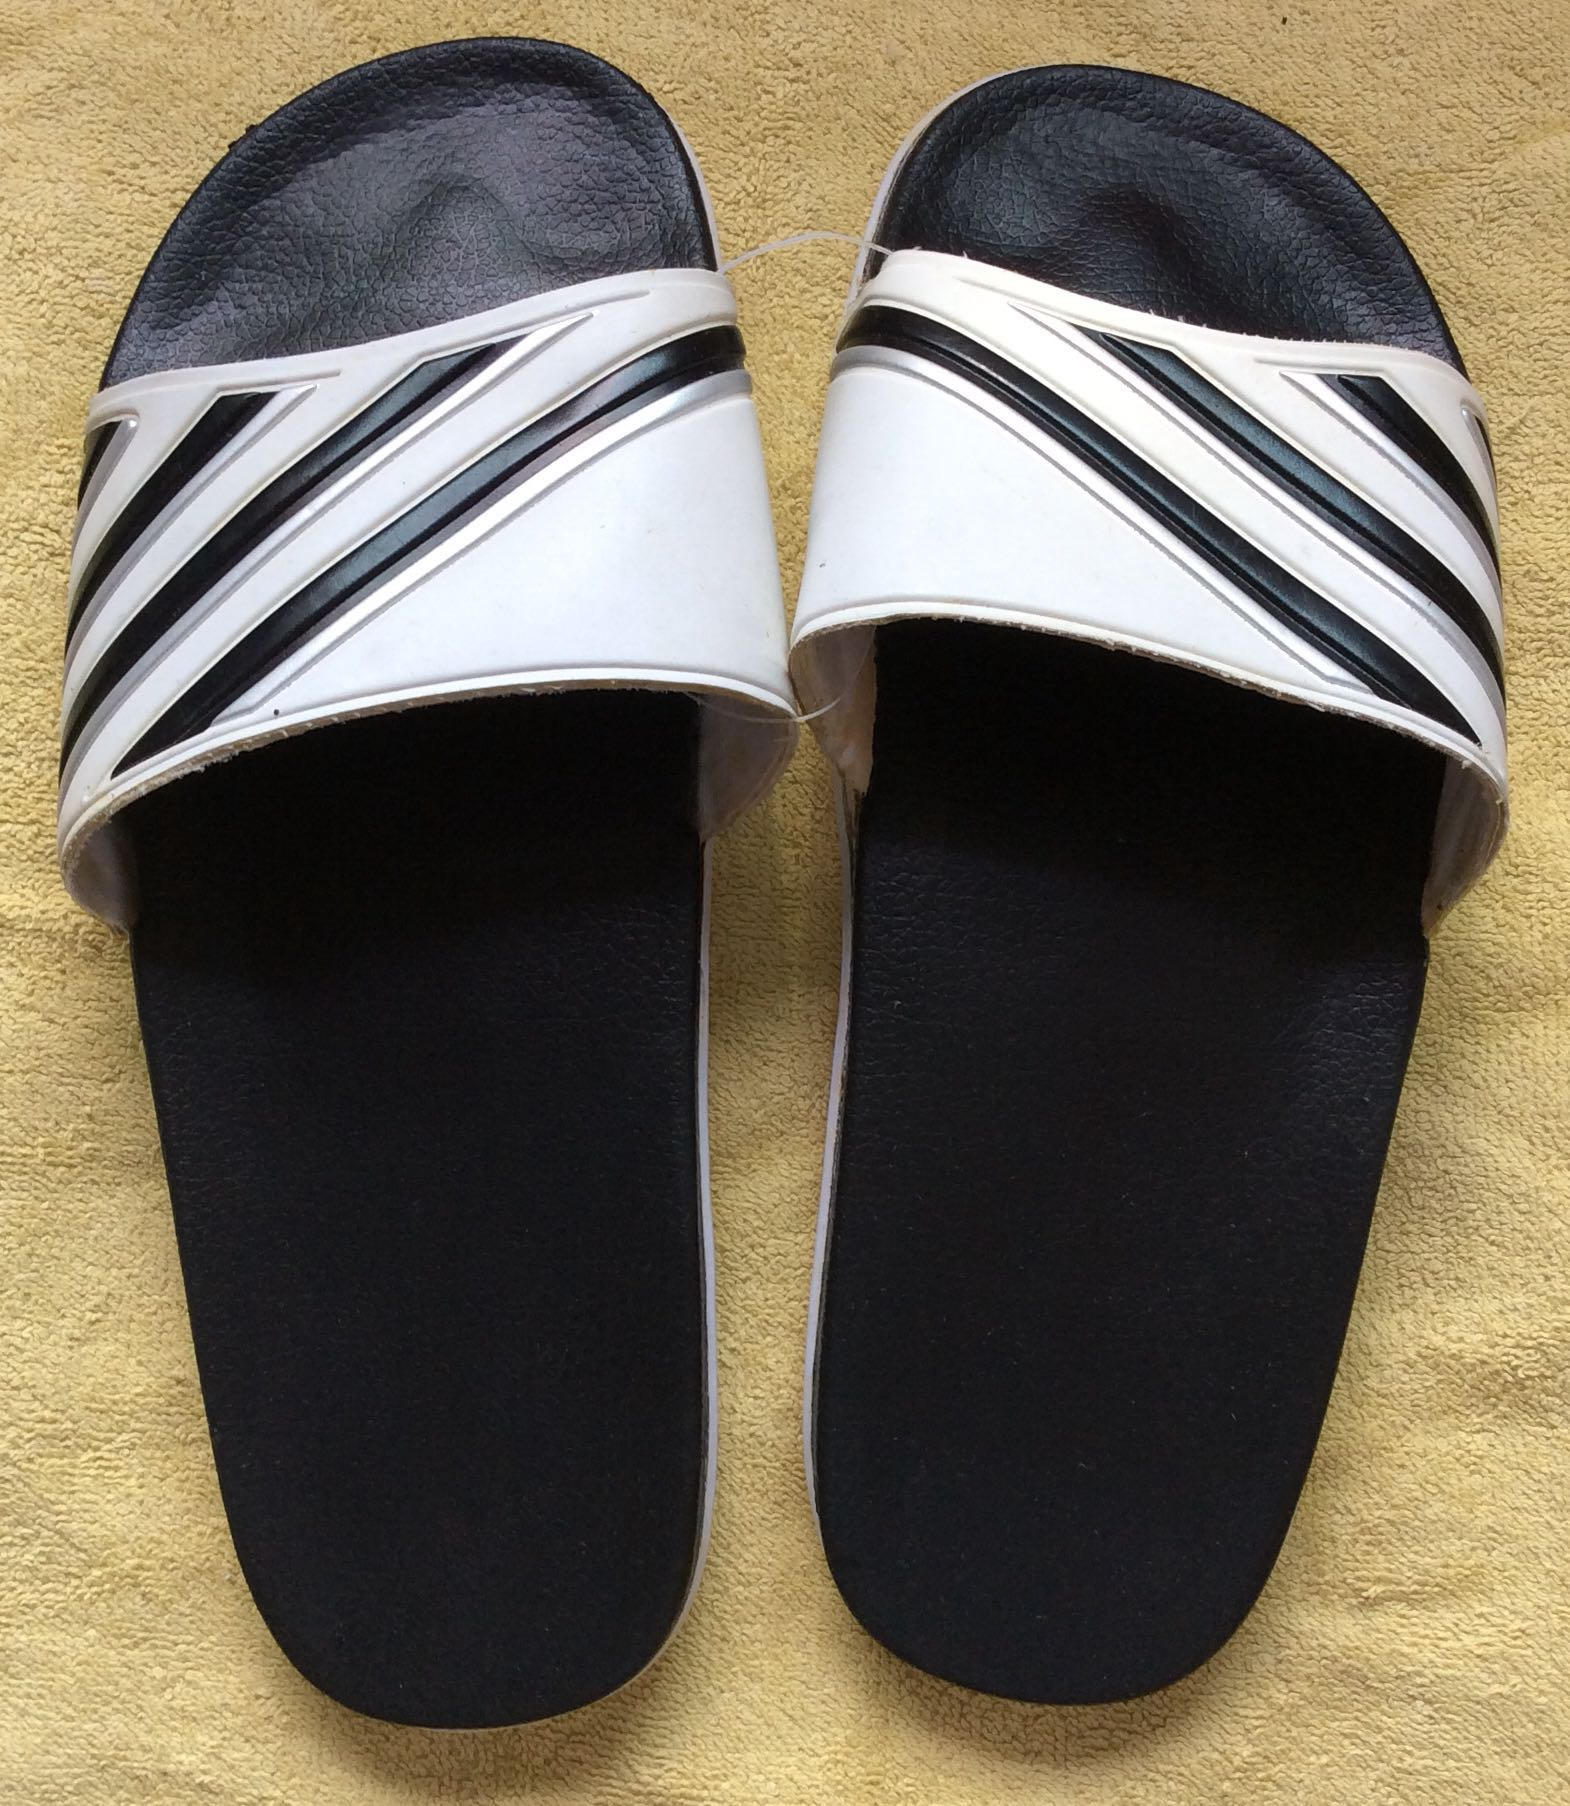 d6f4fed2b50da BN Instinct Men Casual Home   Bedroom   Bathroom Sandals Slippers ...